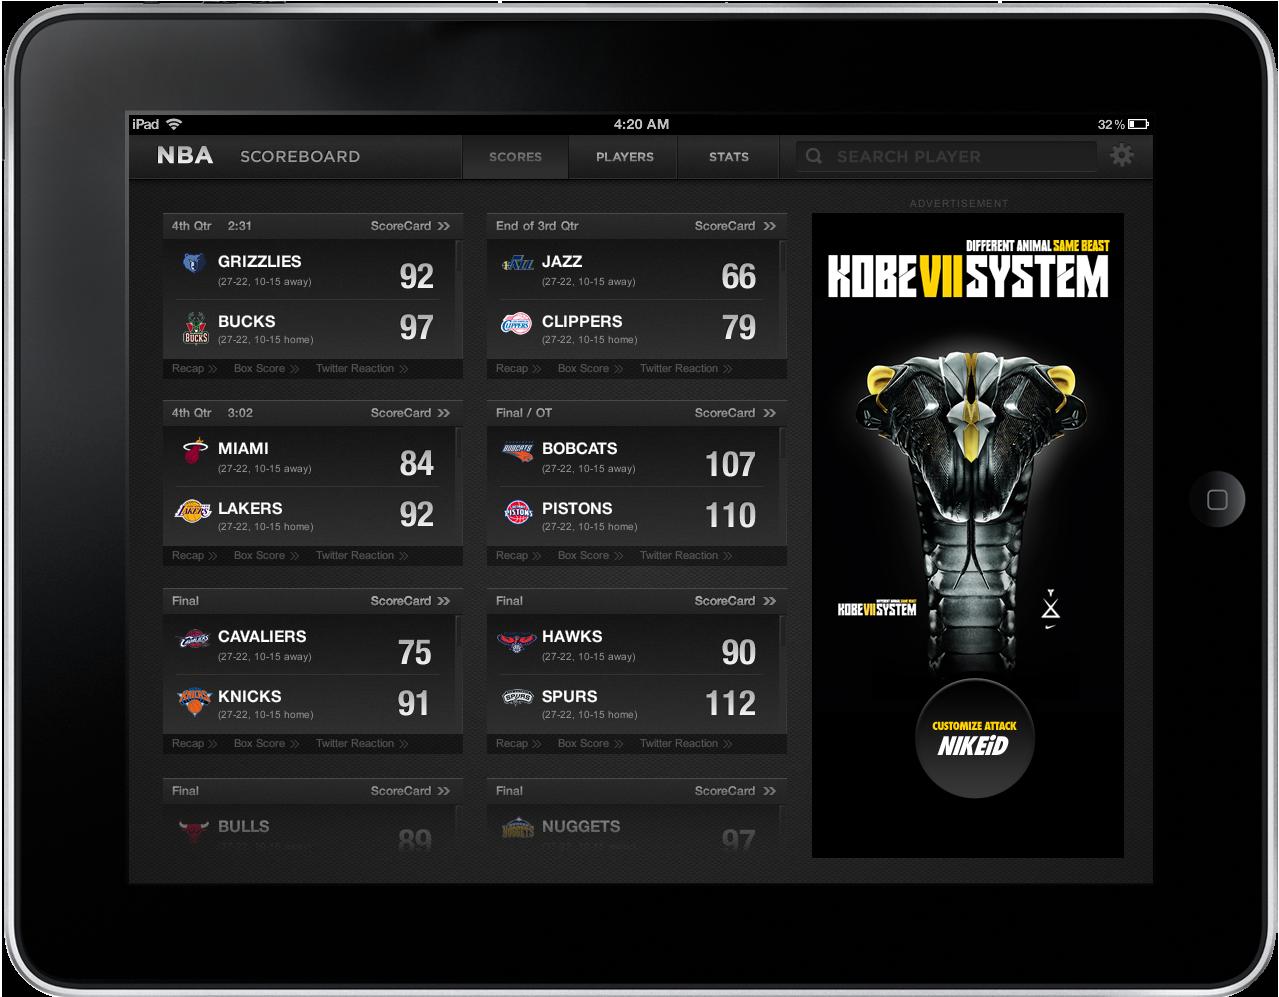 iPad App (NBA Scores, Stats and Player Info) Nba scores